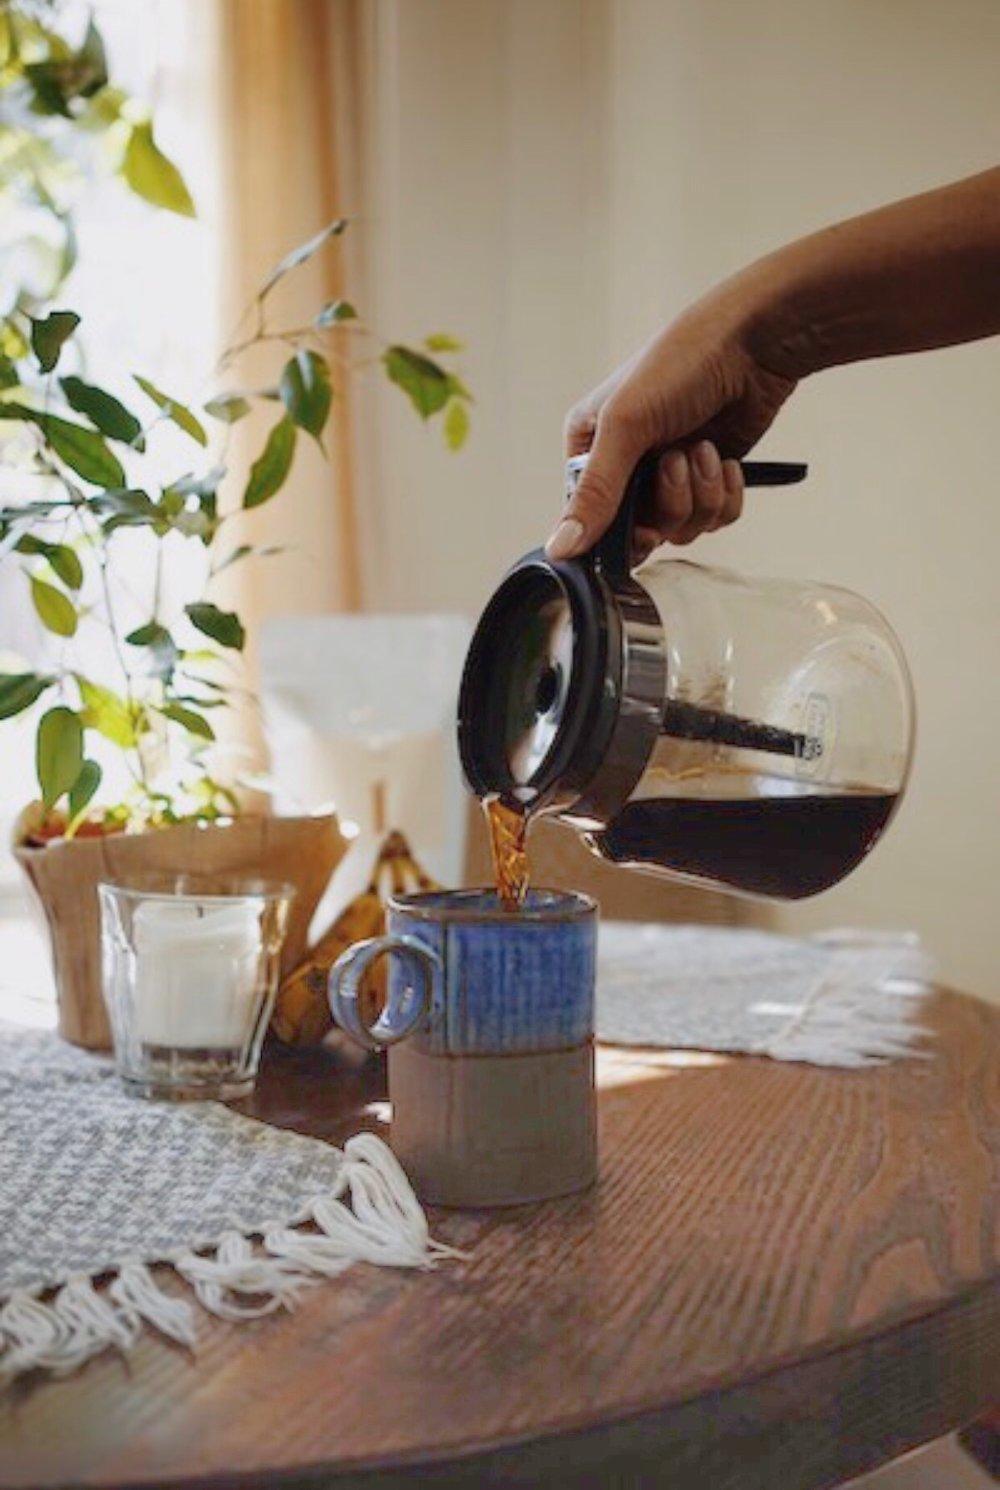 Life happens over coffee. -